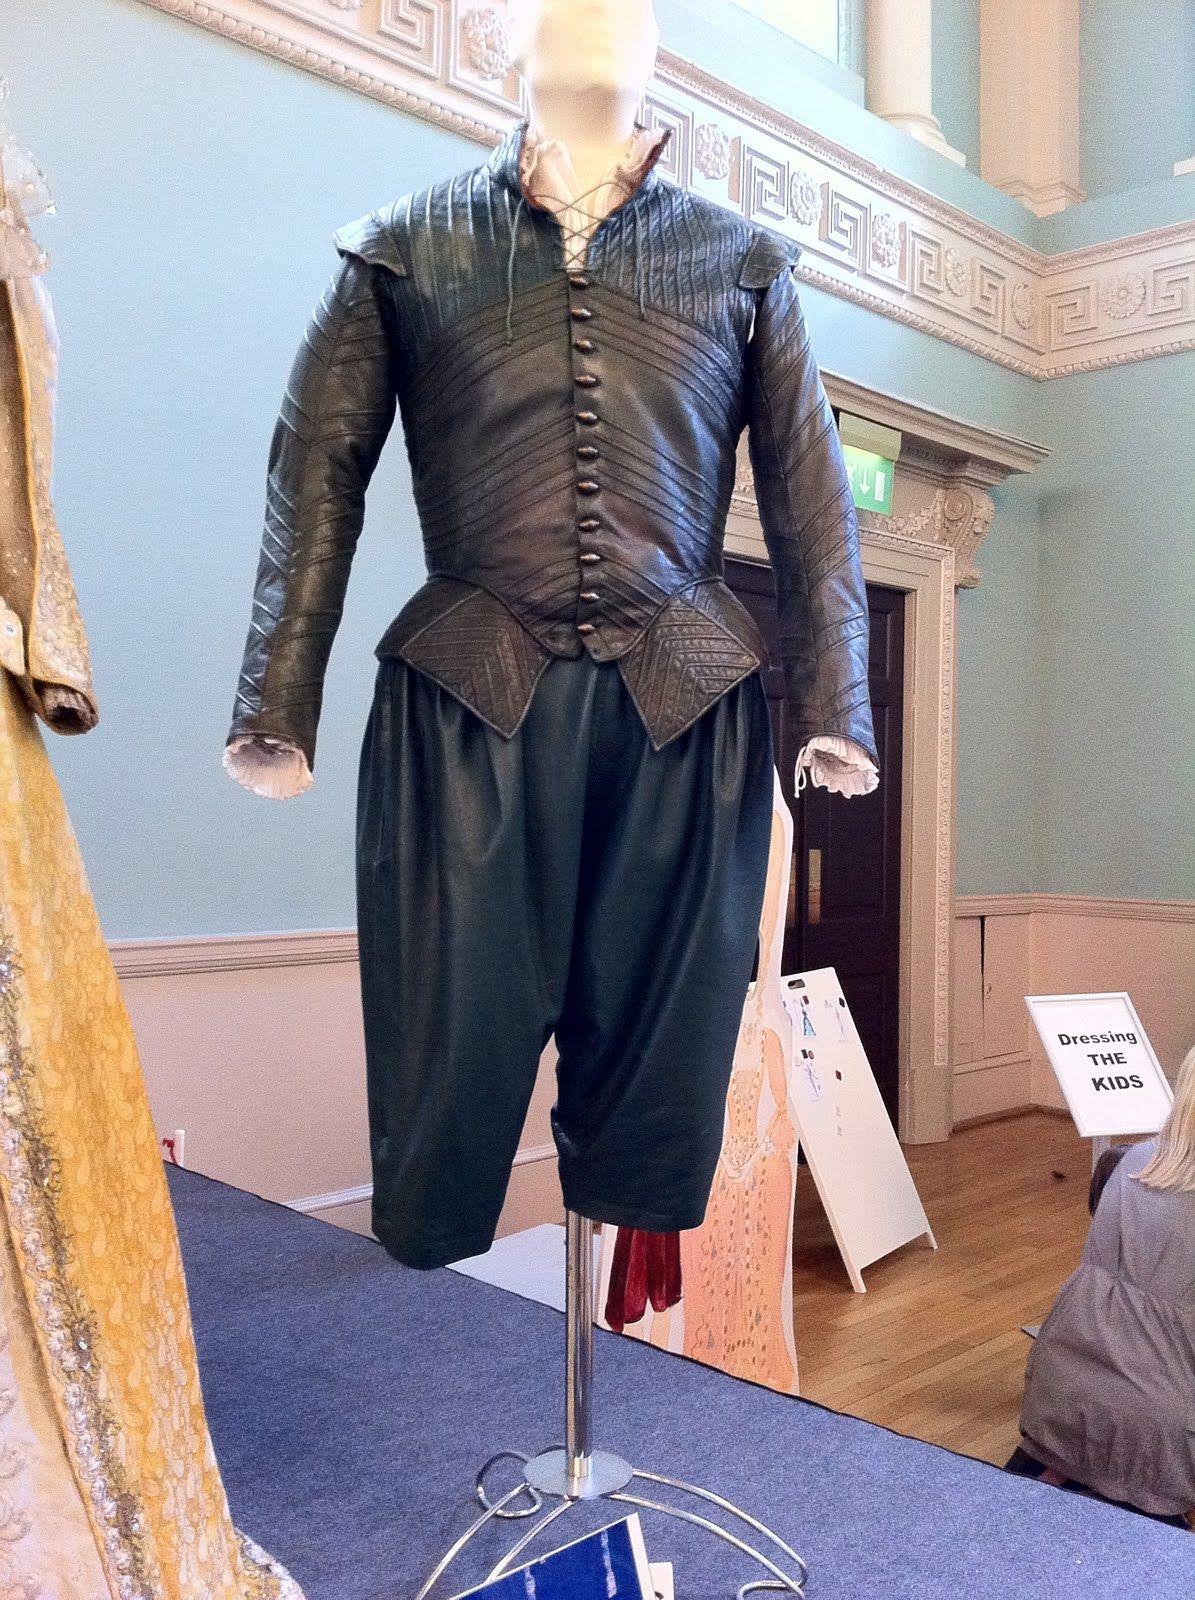 shakespeare in love costumes - Pesquisa Google | Century 16 ...